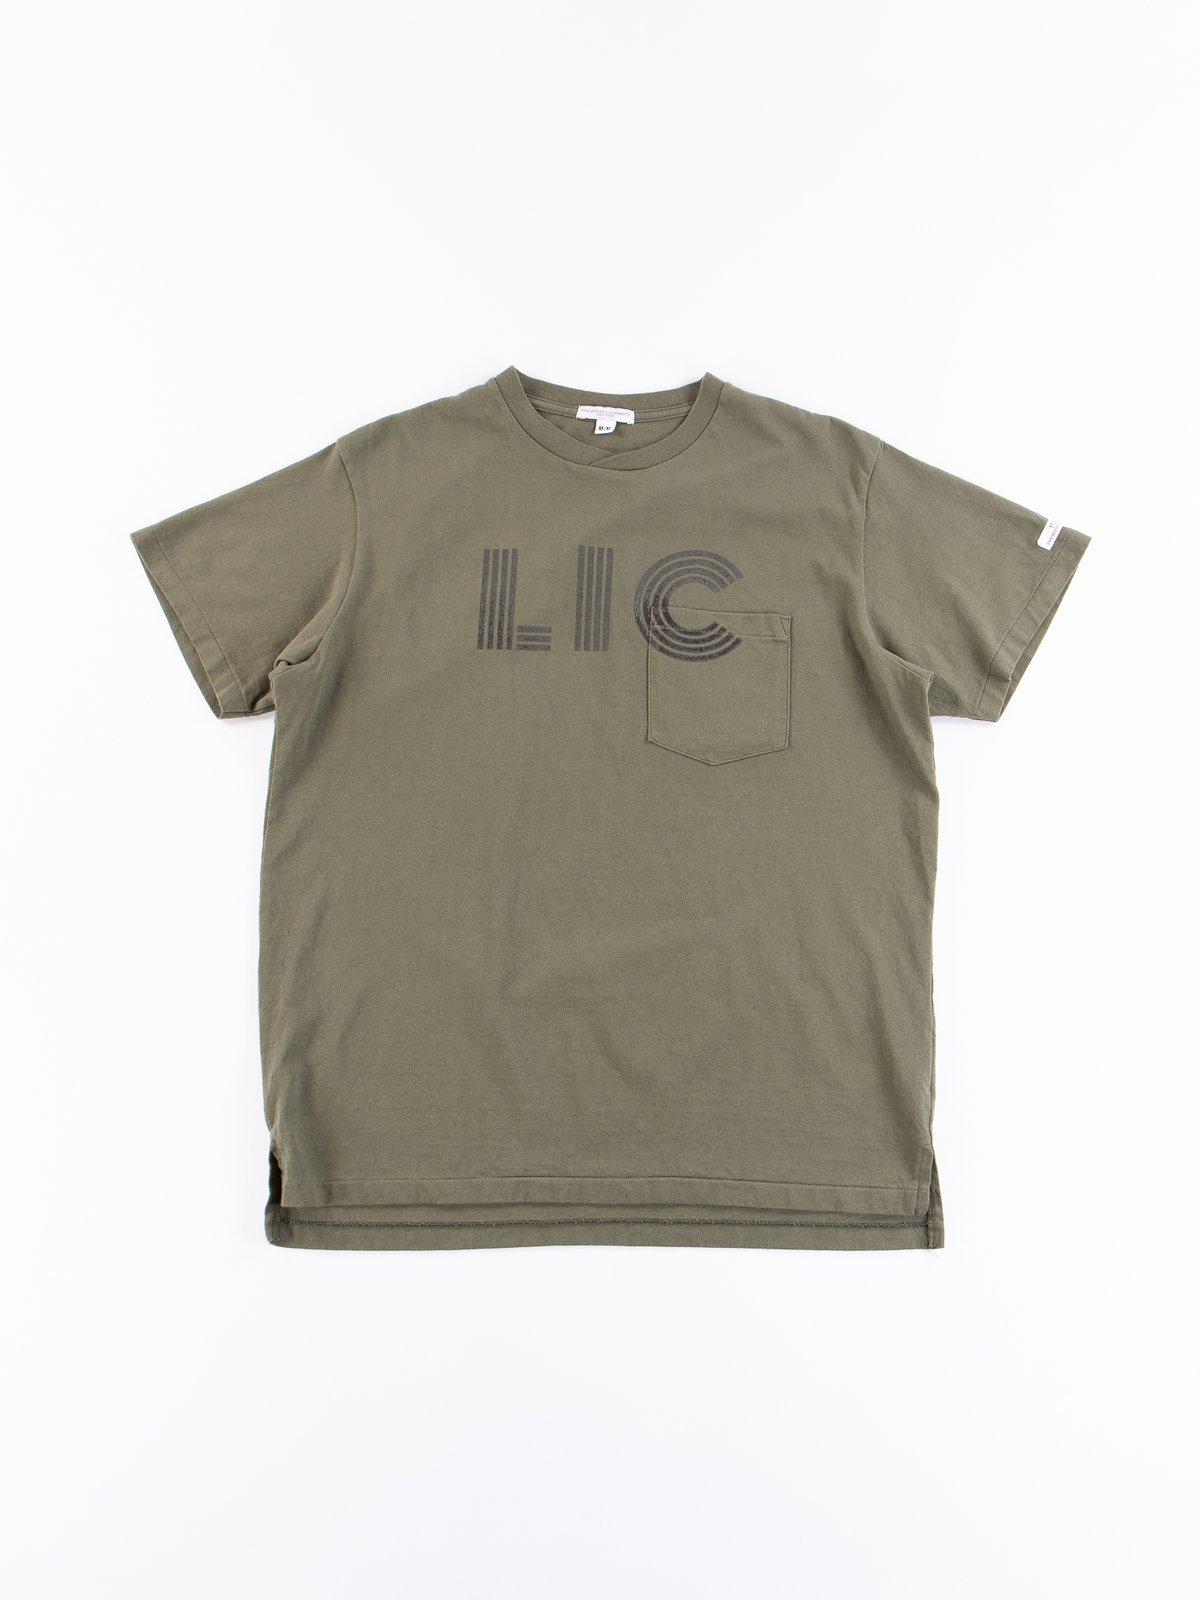 Olive LIC Printed T–Shirt - Image 1